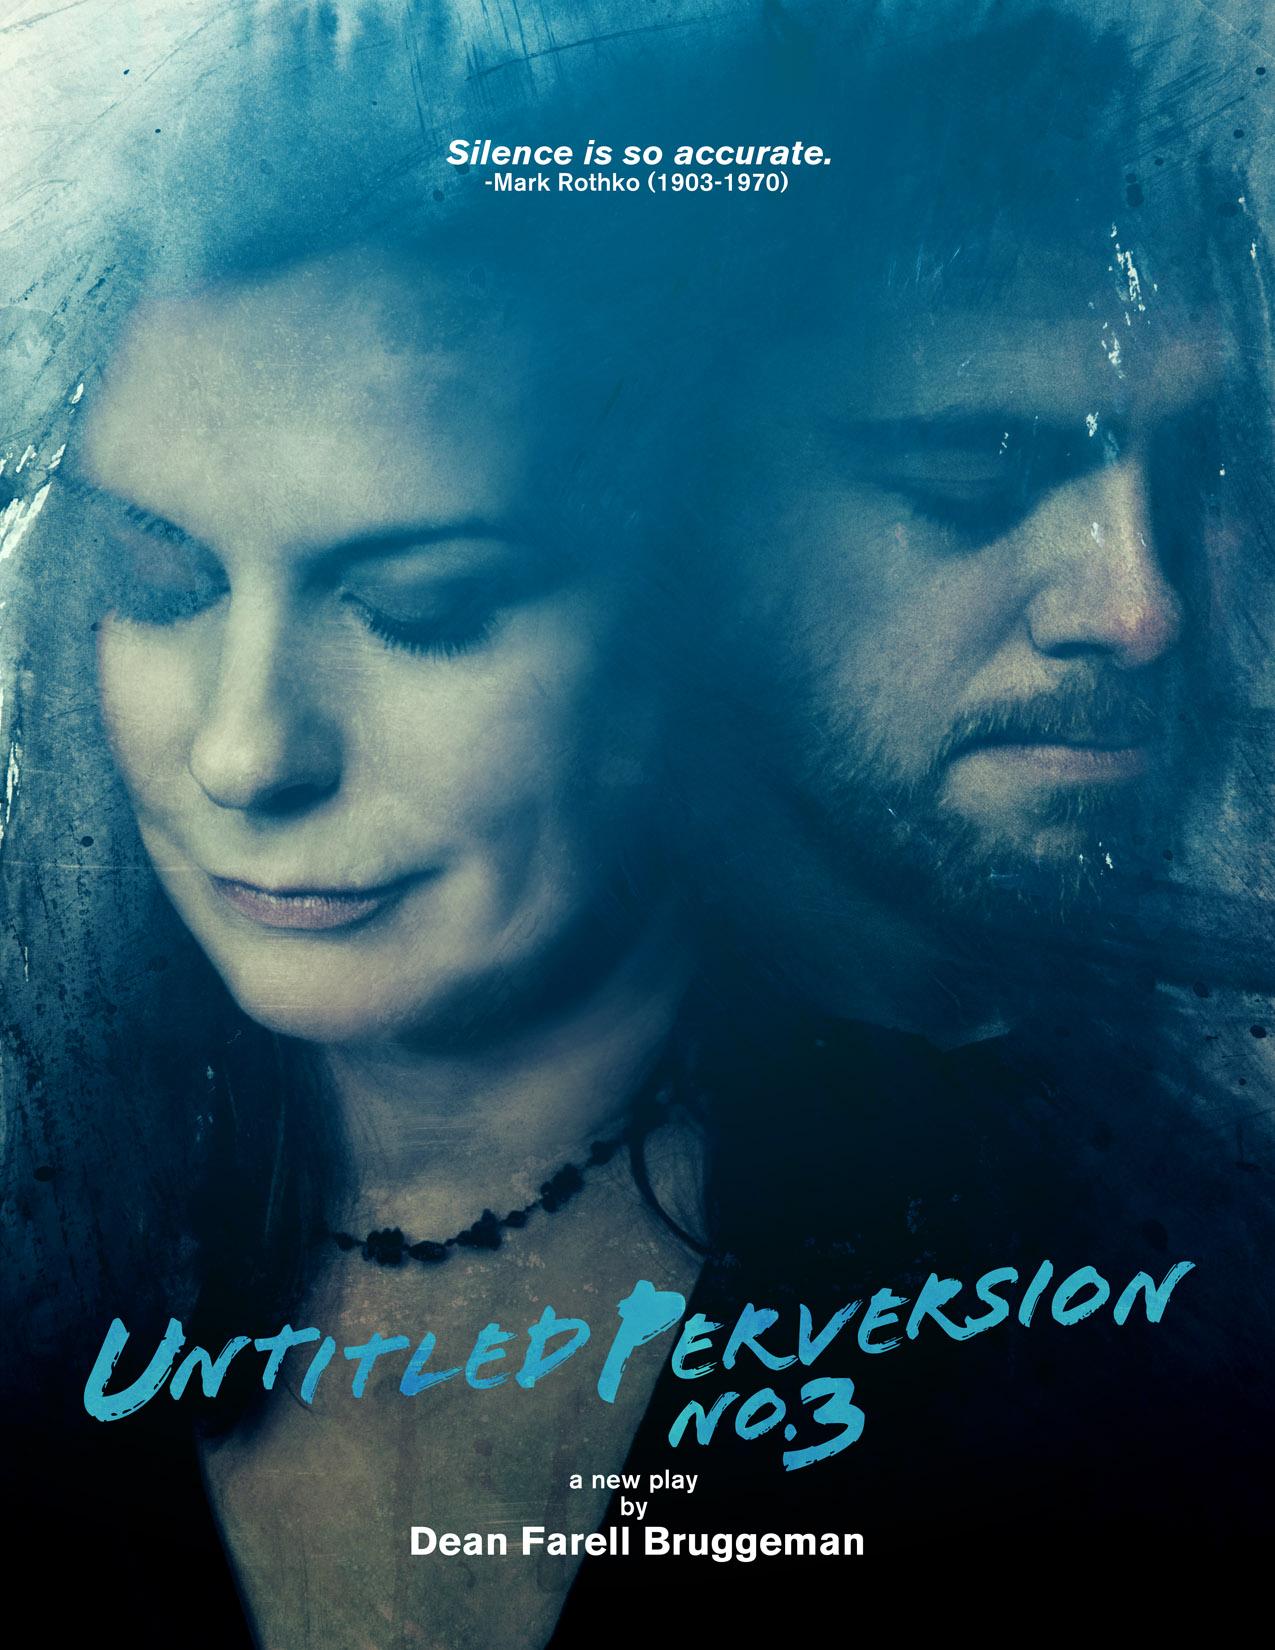 """Untitled Perversion No. 3"""